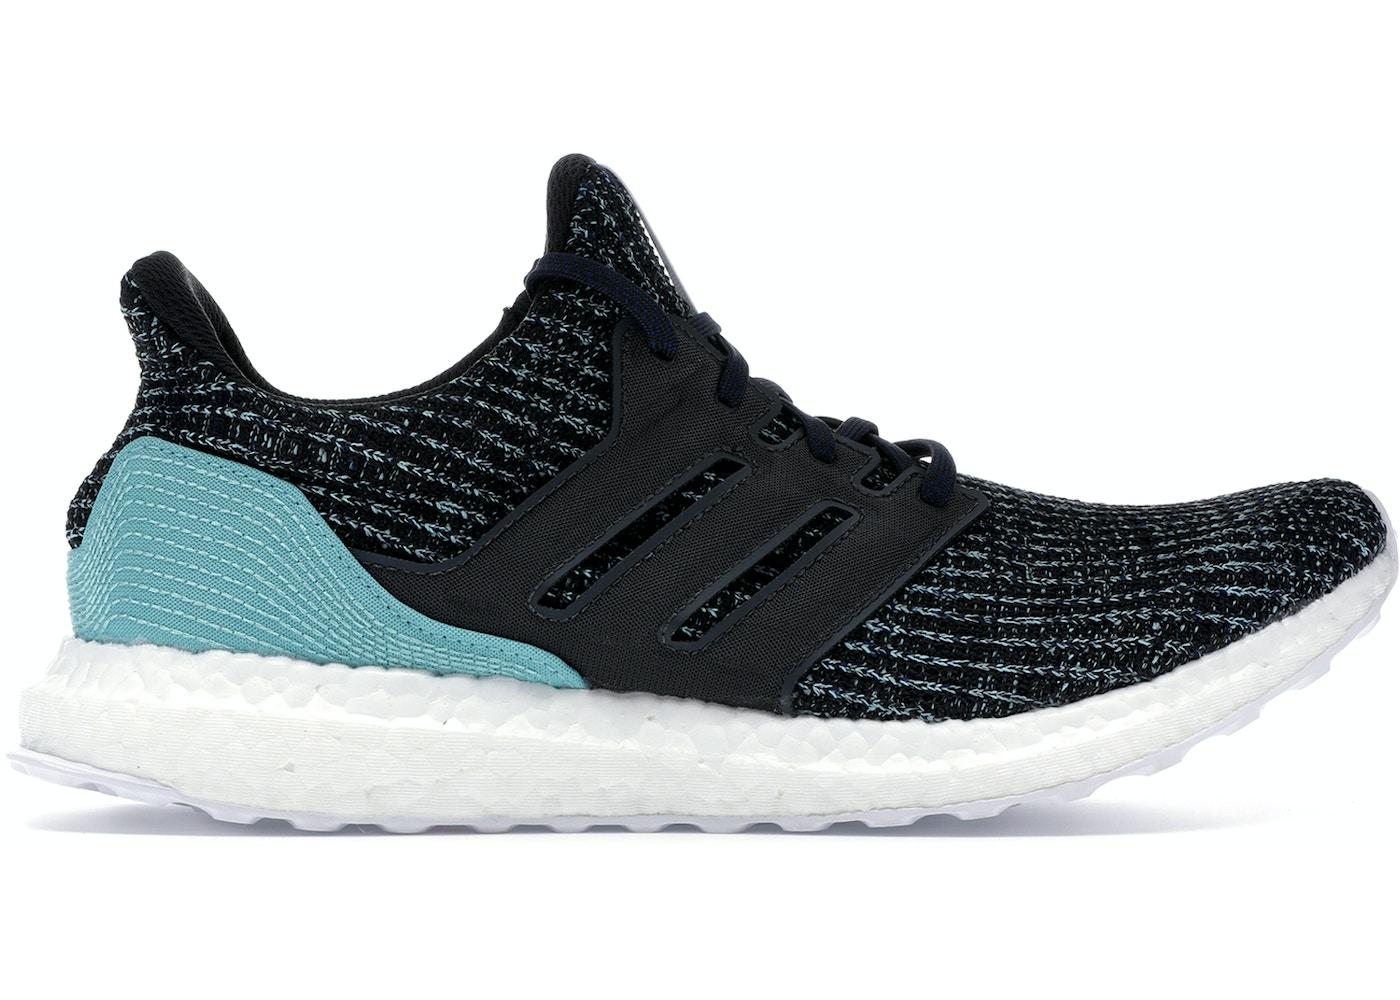 Adidas Ultra Boost 4 0 Parley Carbon Cg3673